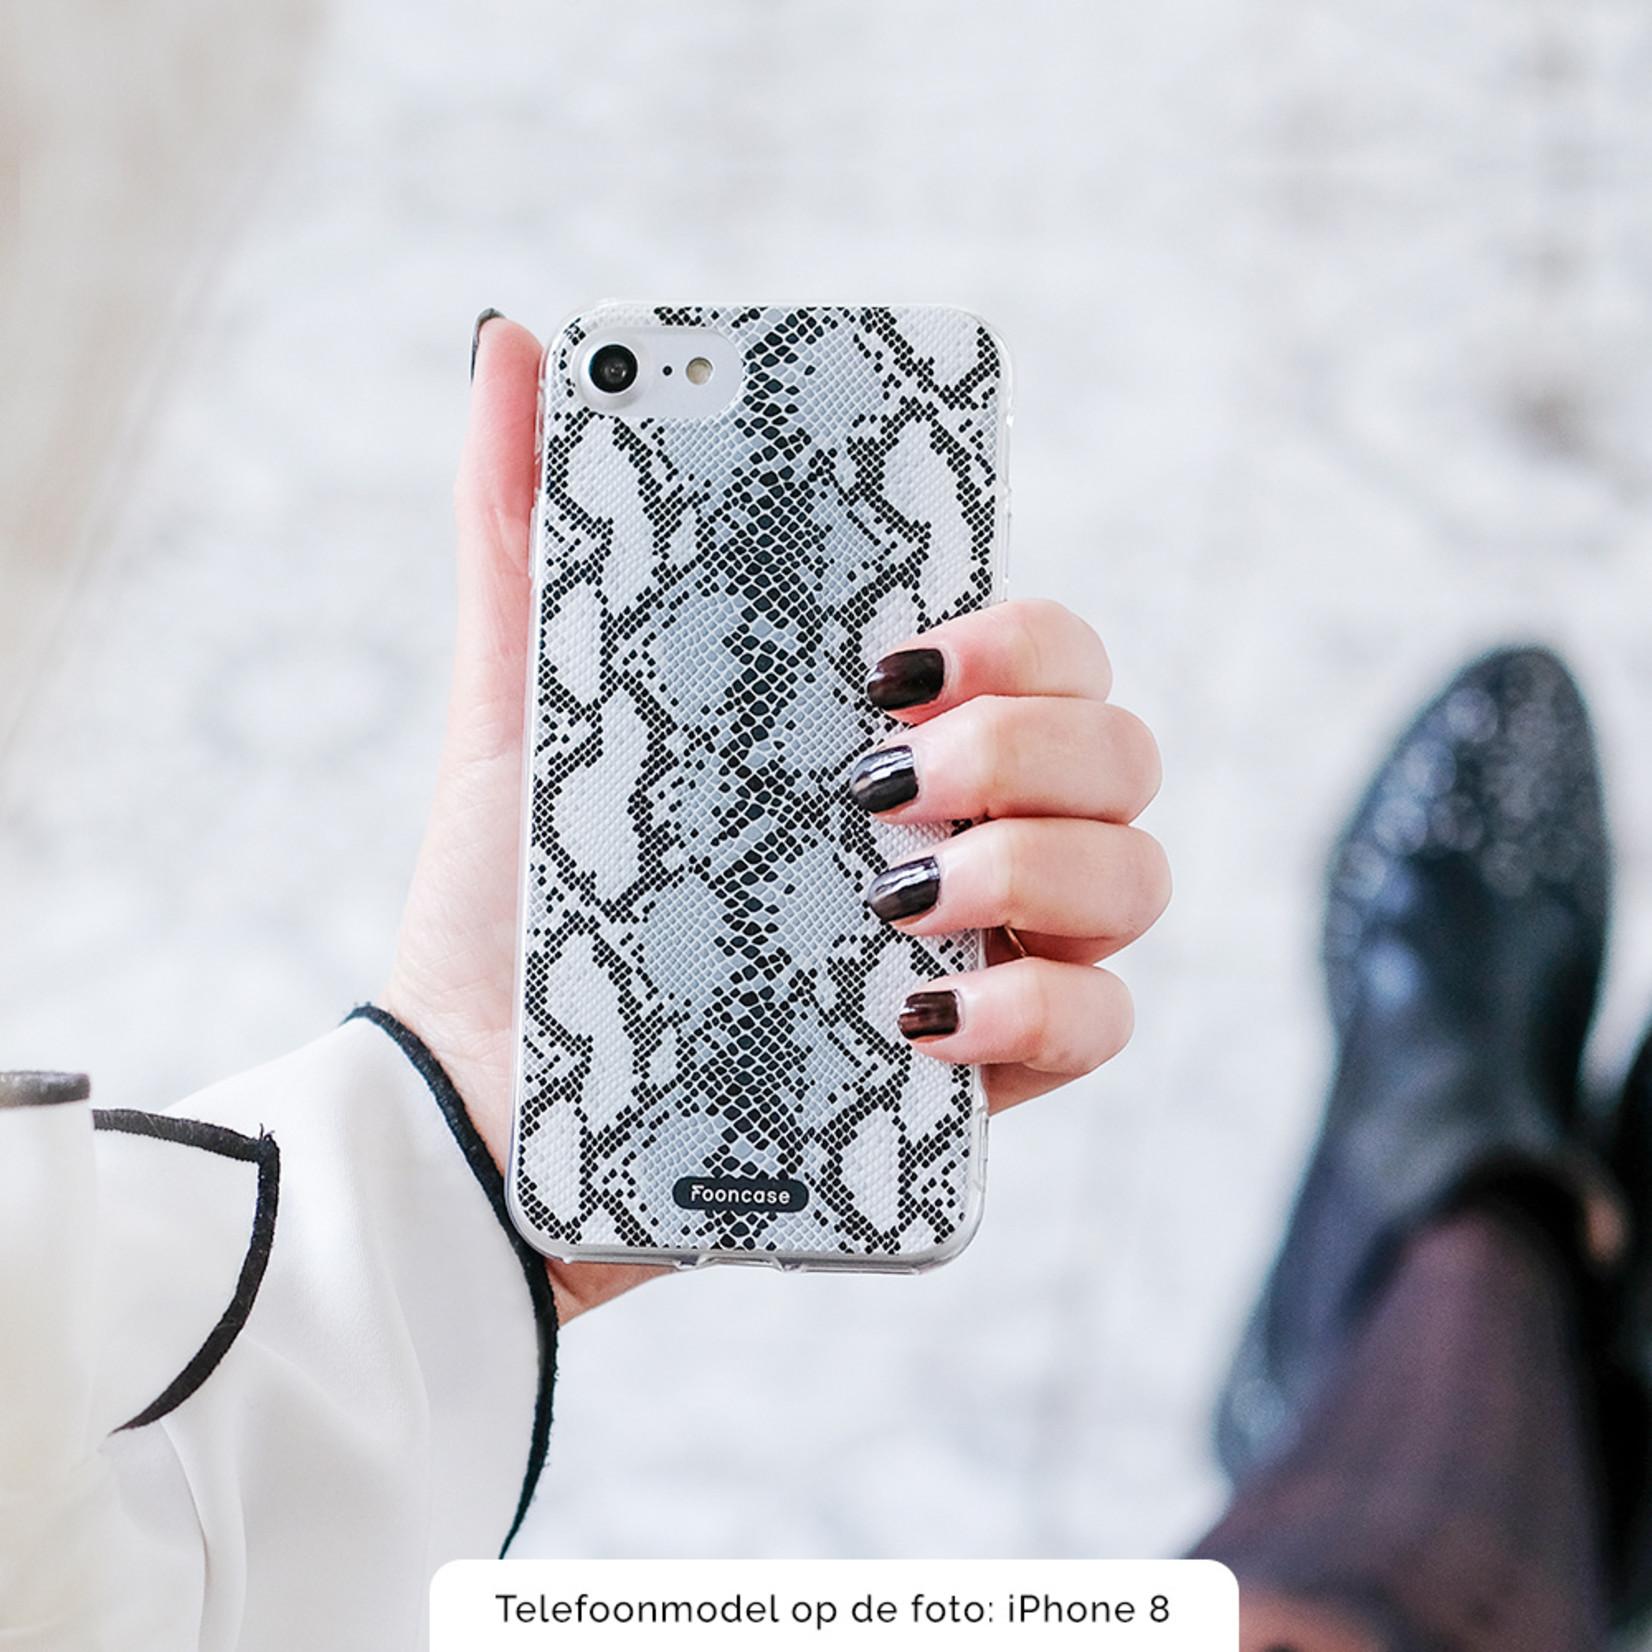 FOONCASE Samsung Galaxy J5 2017 hoesje TPU Soft Case - Back Cover - Snake it / Slangen print